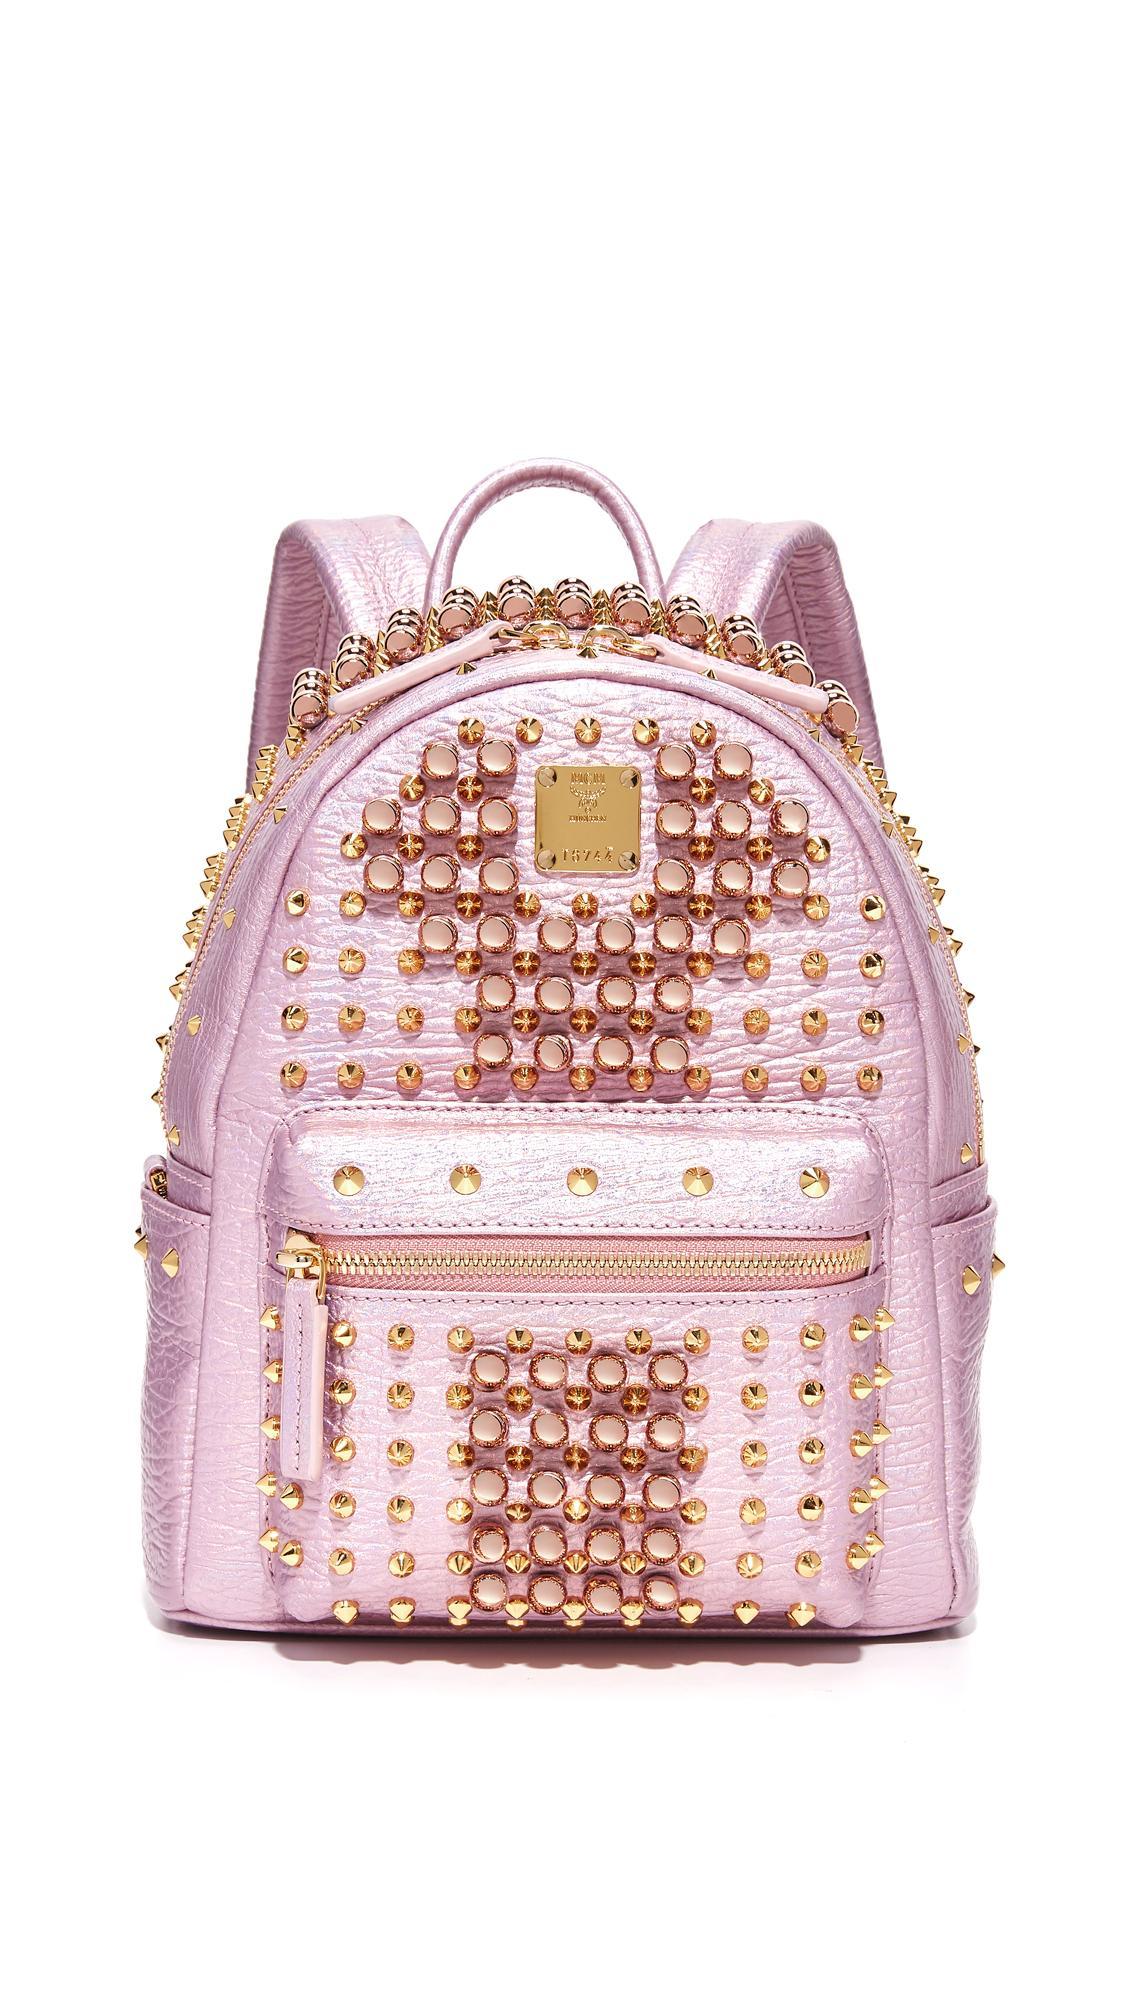 4dda04d61be Lyst - MCM Stark Pearl Stud Backpack in Pink